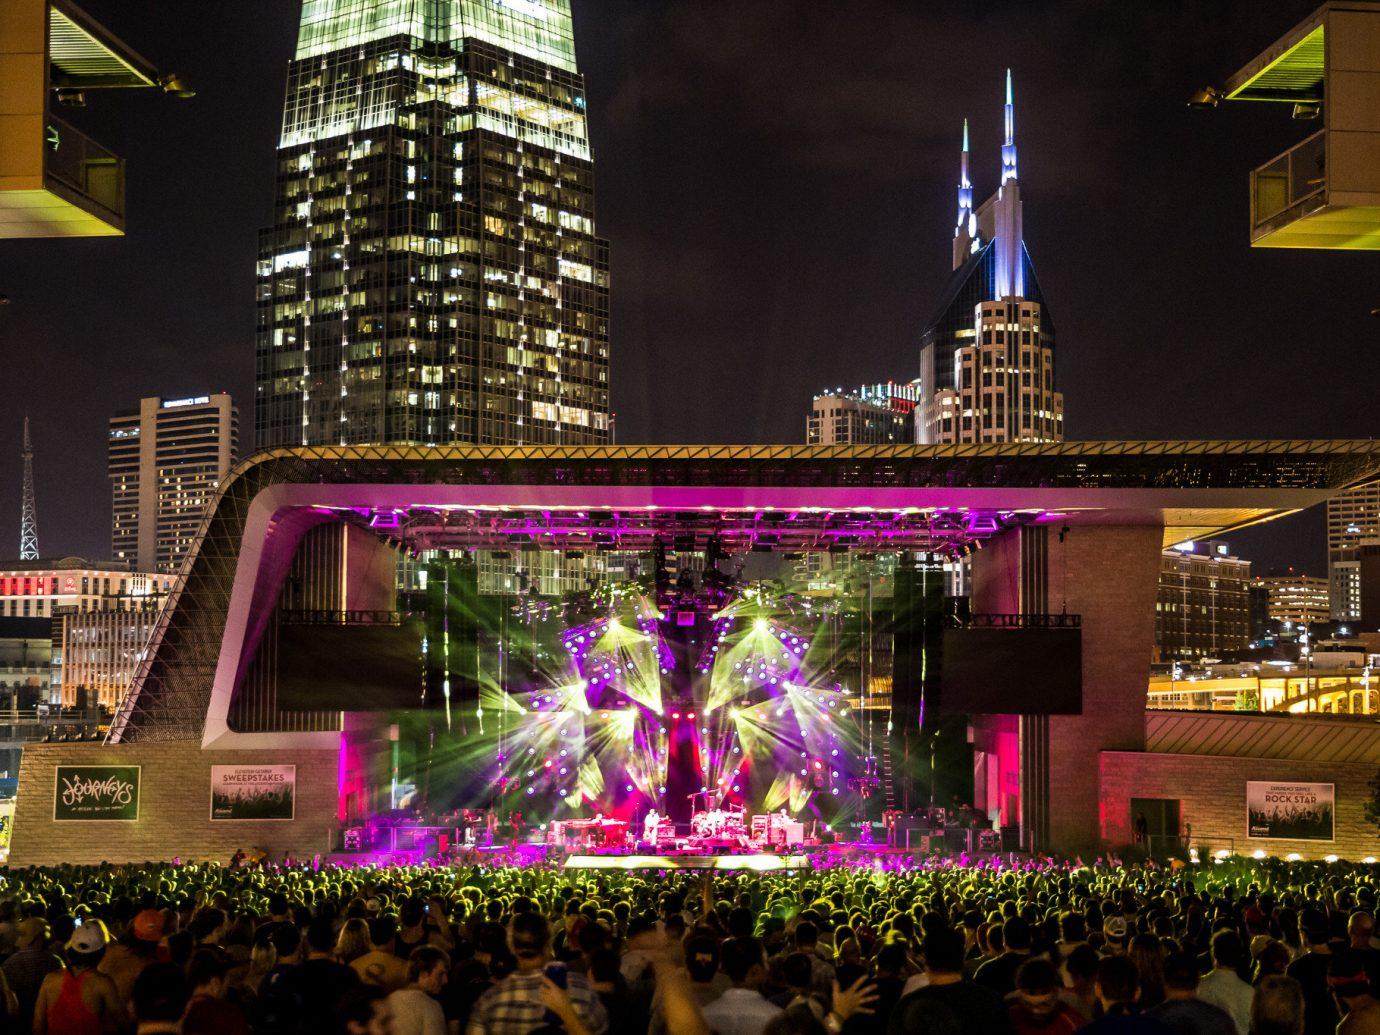 Offbeat crowd metropolis night City Downtown cityscape